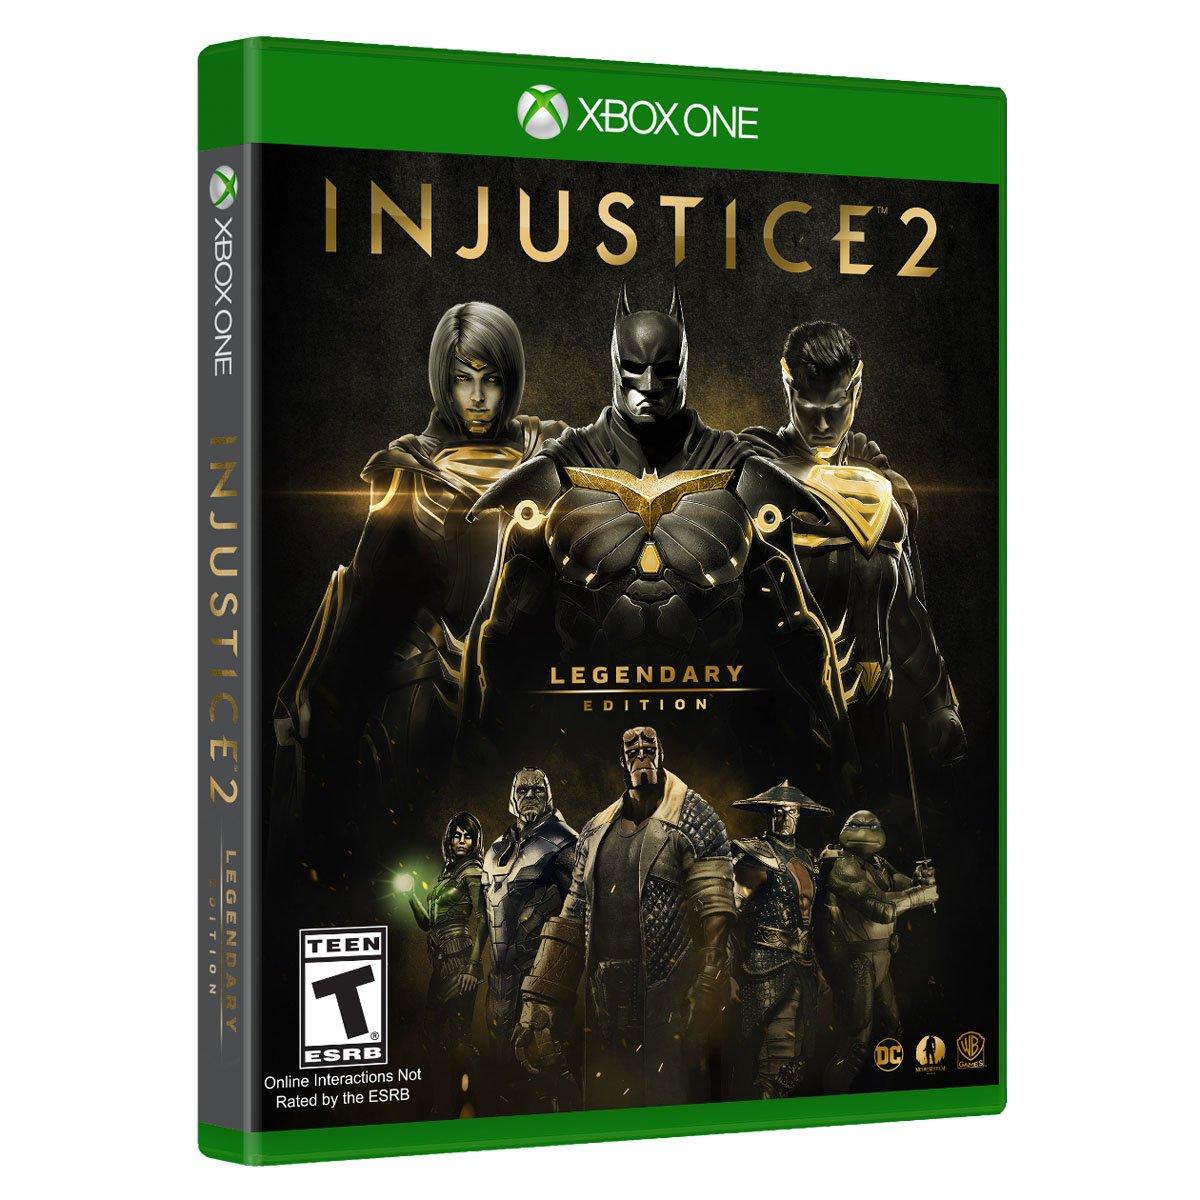 Xbox One Injustice 2 Legendary Edition